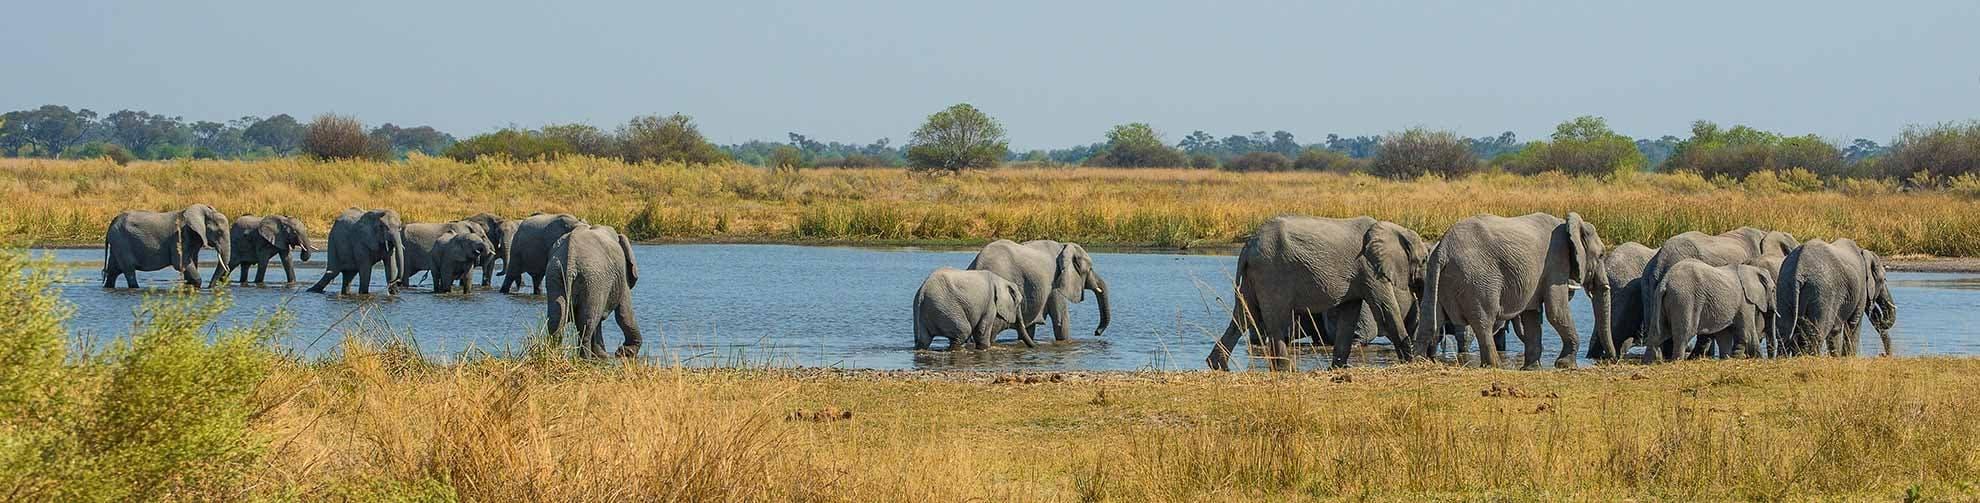 Fiche Pays Botswana